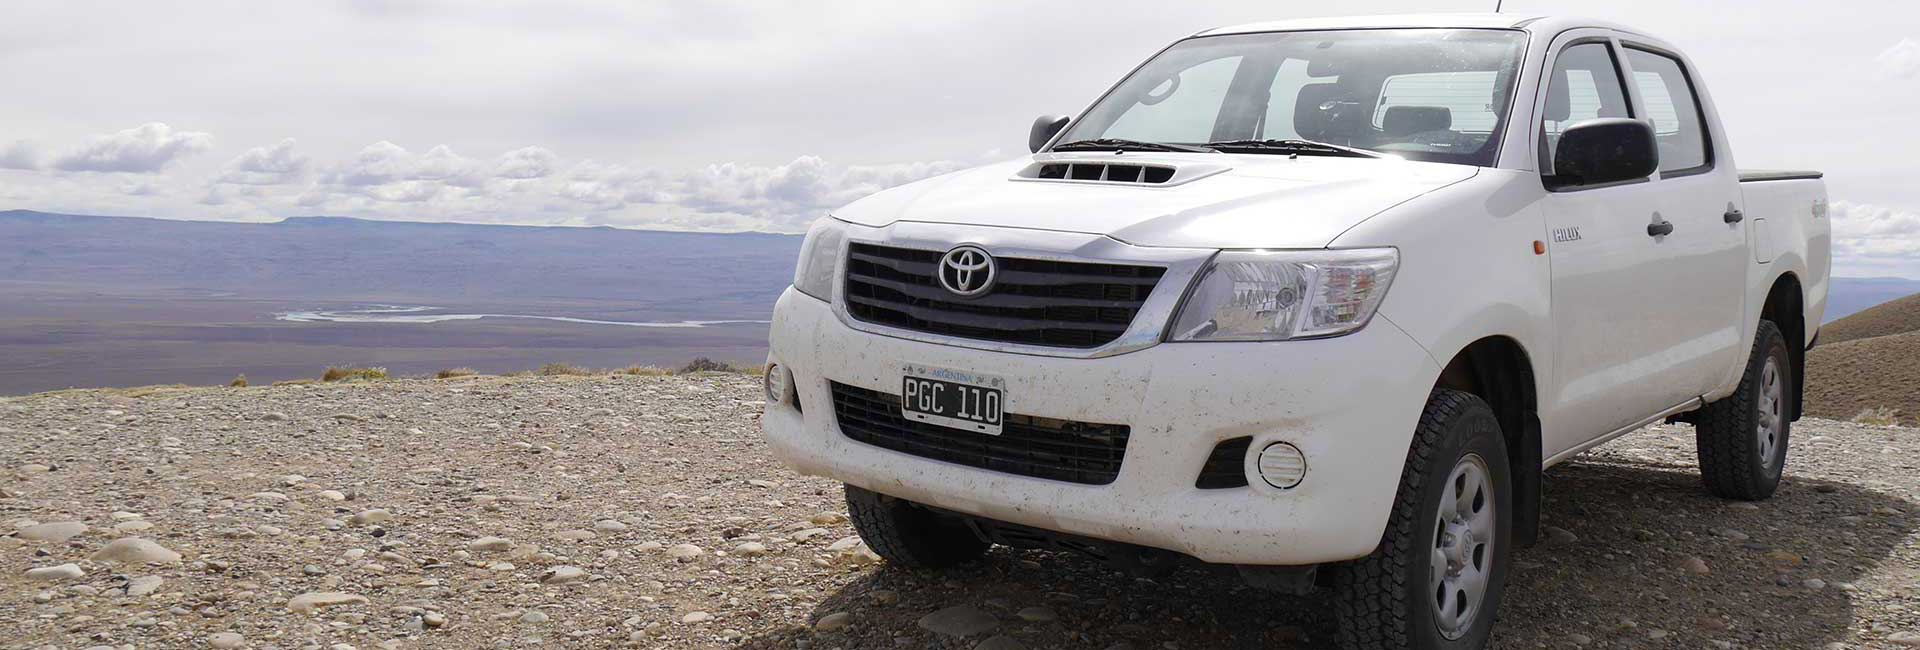 Hilux in Patagonia